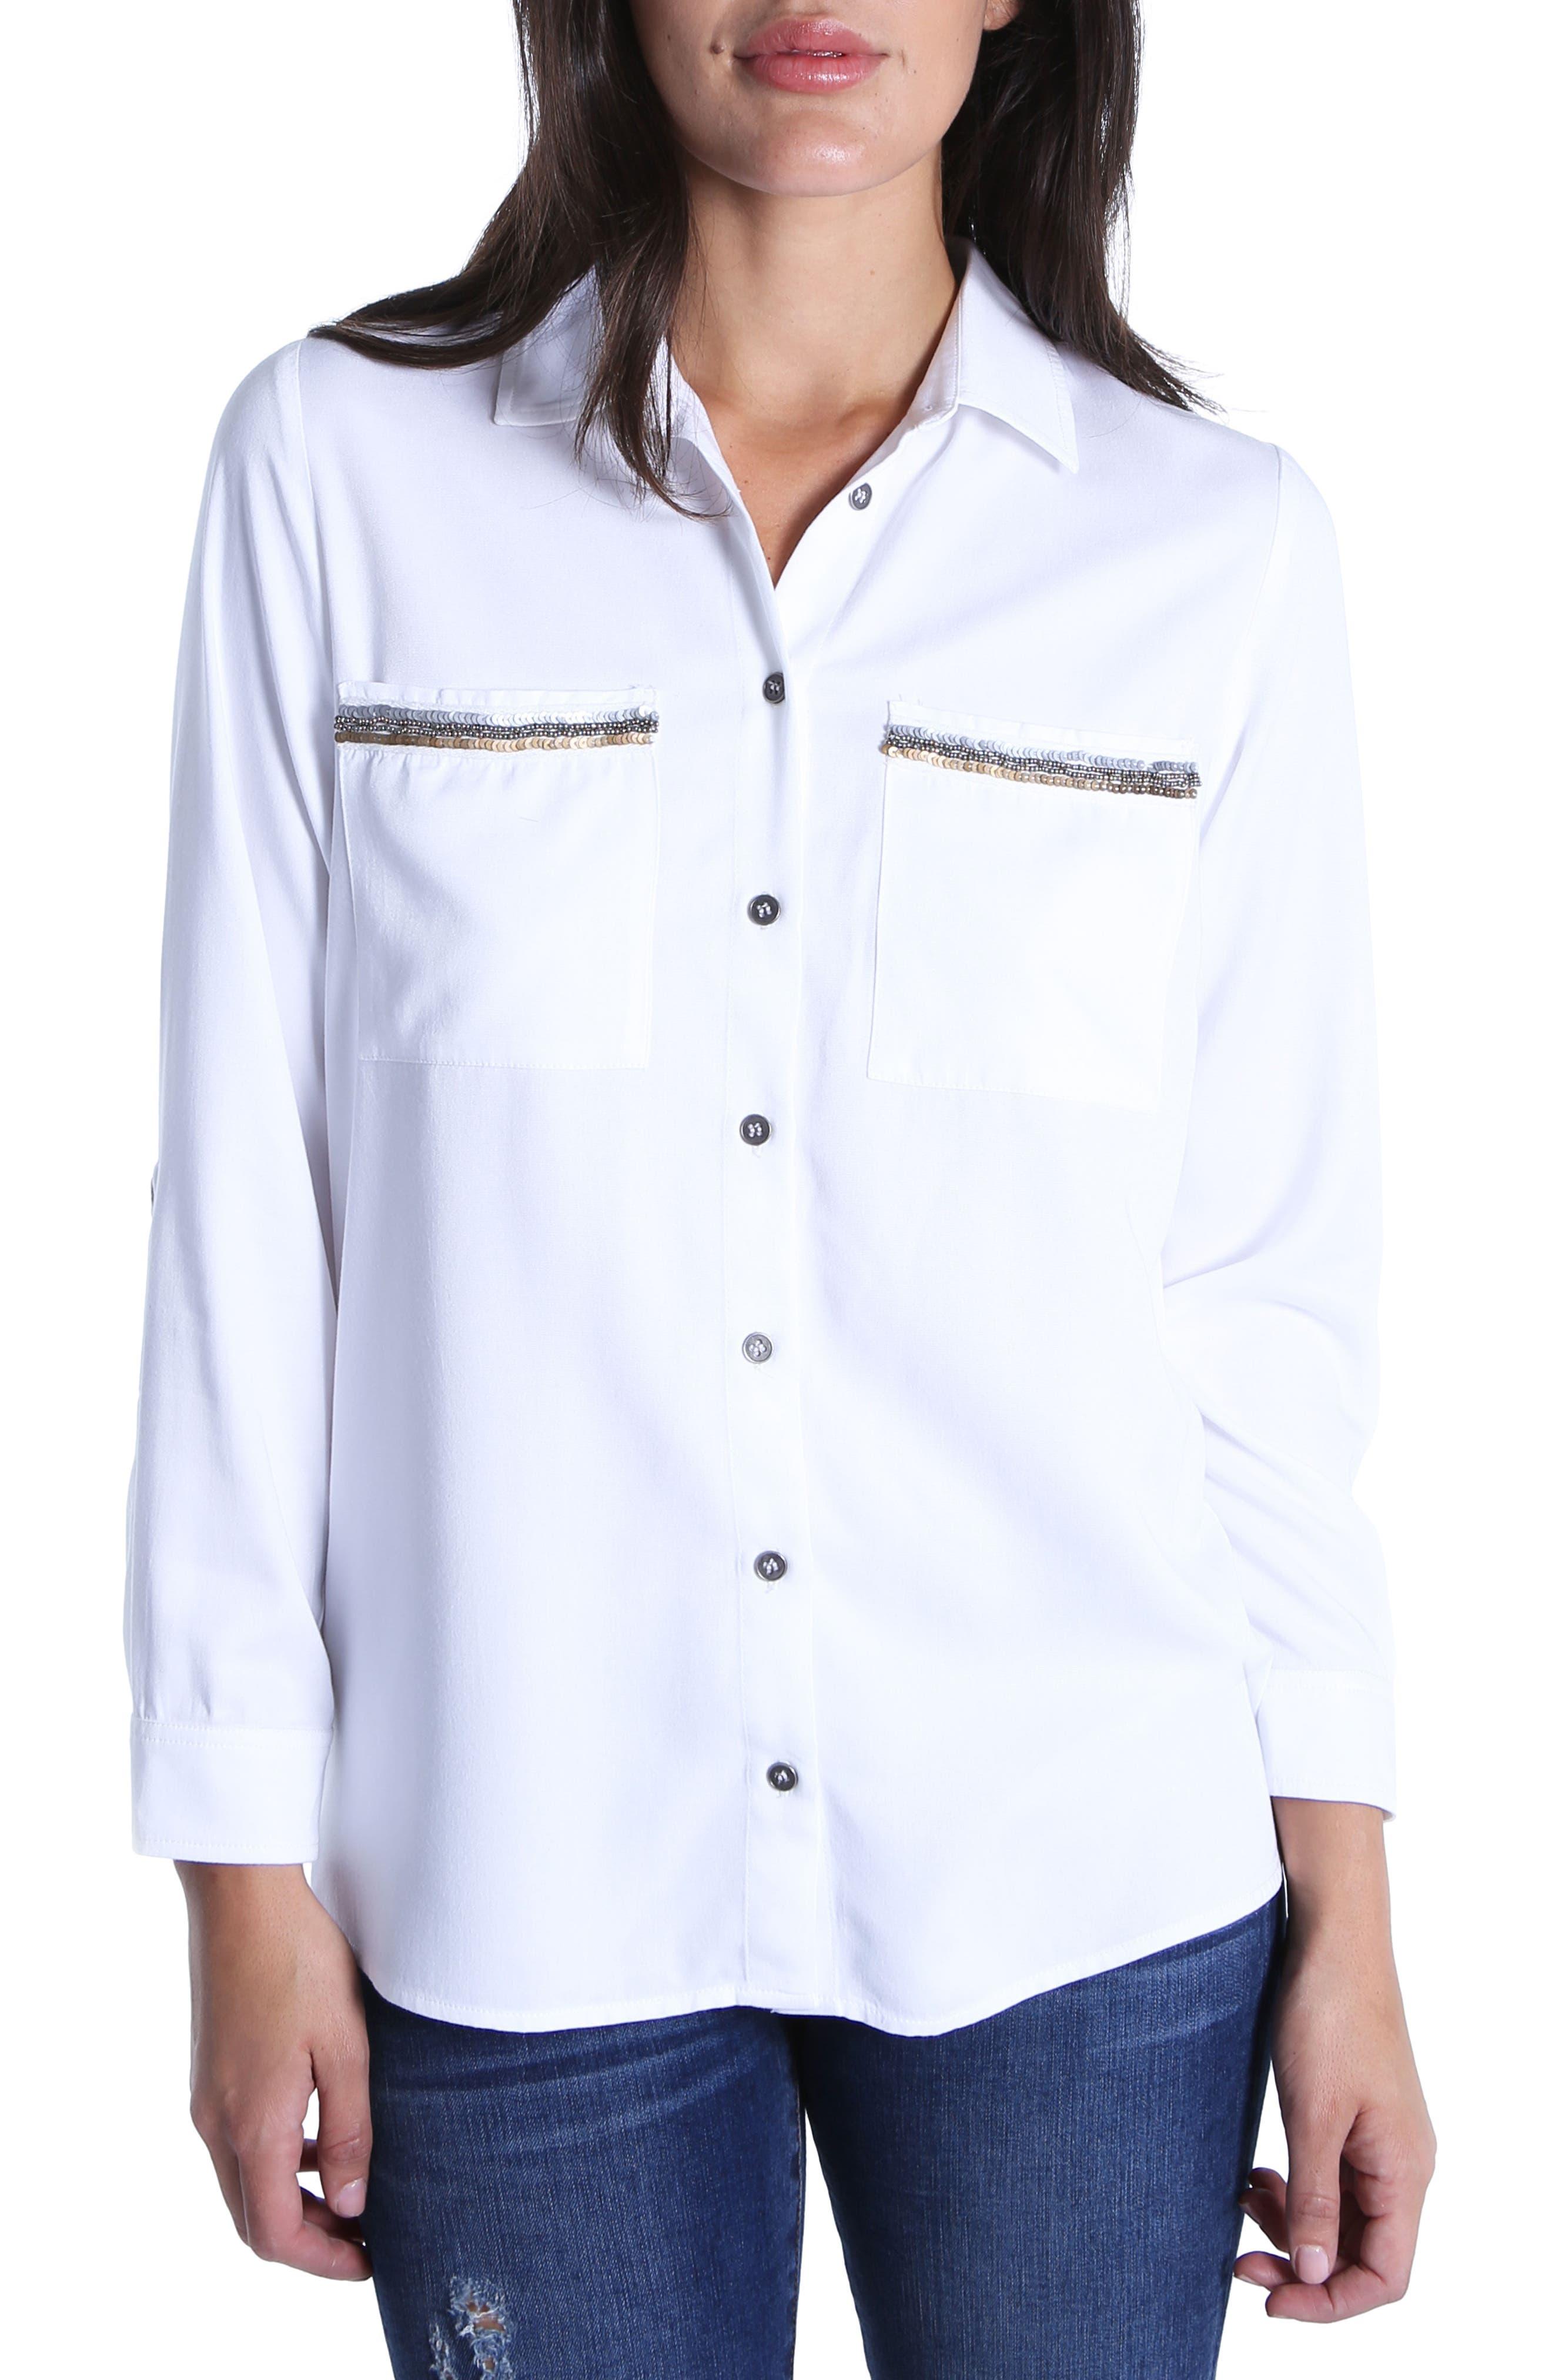 Danny Sequin Pocket Shirt,                             Main thumbnail 1, color,                             100